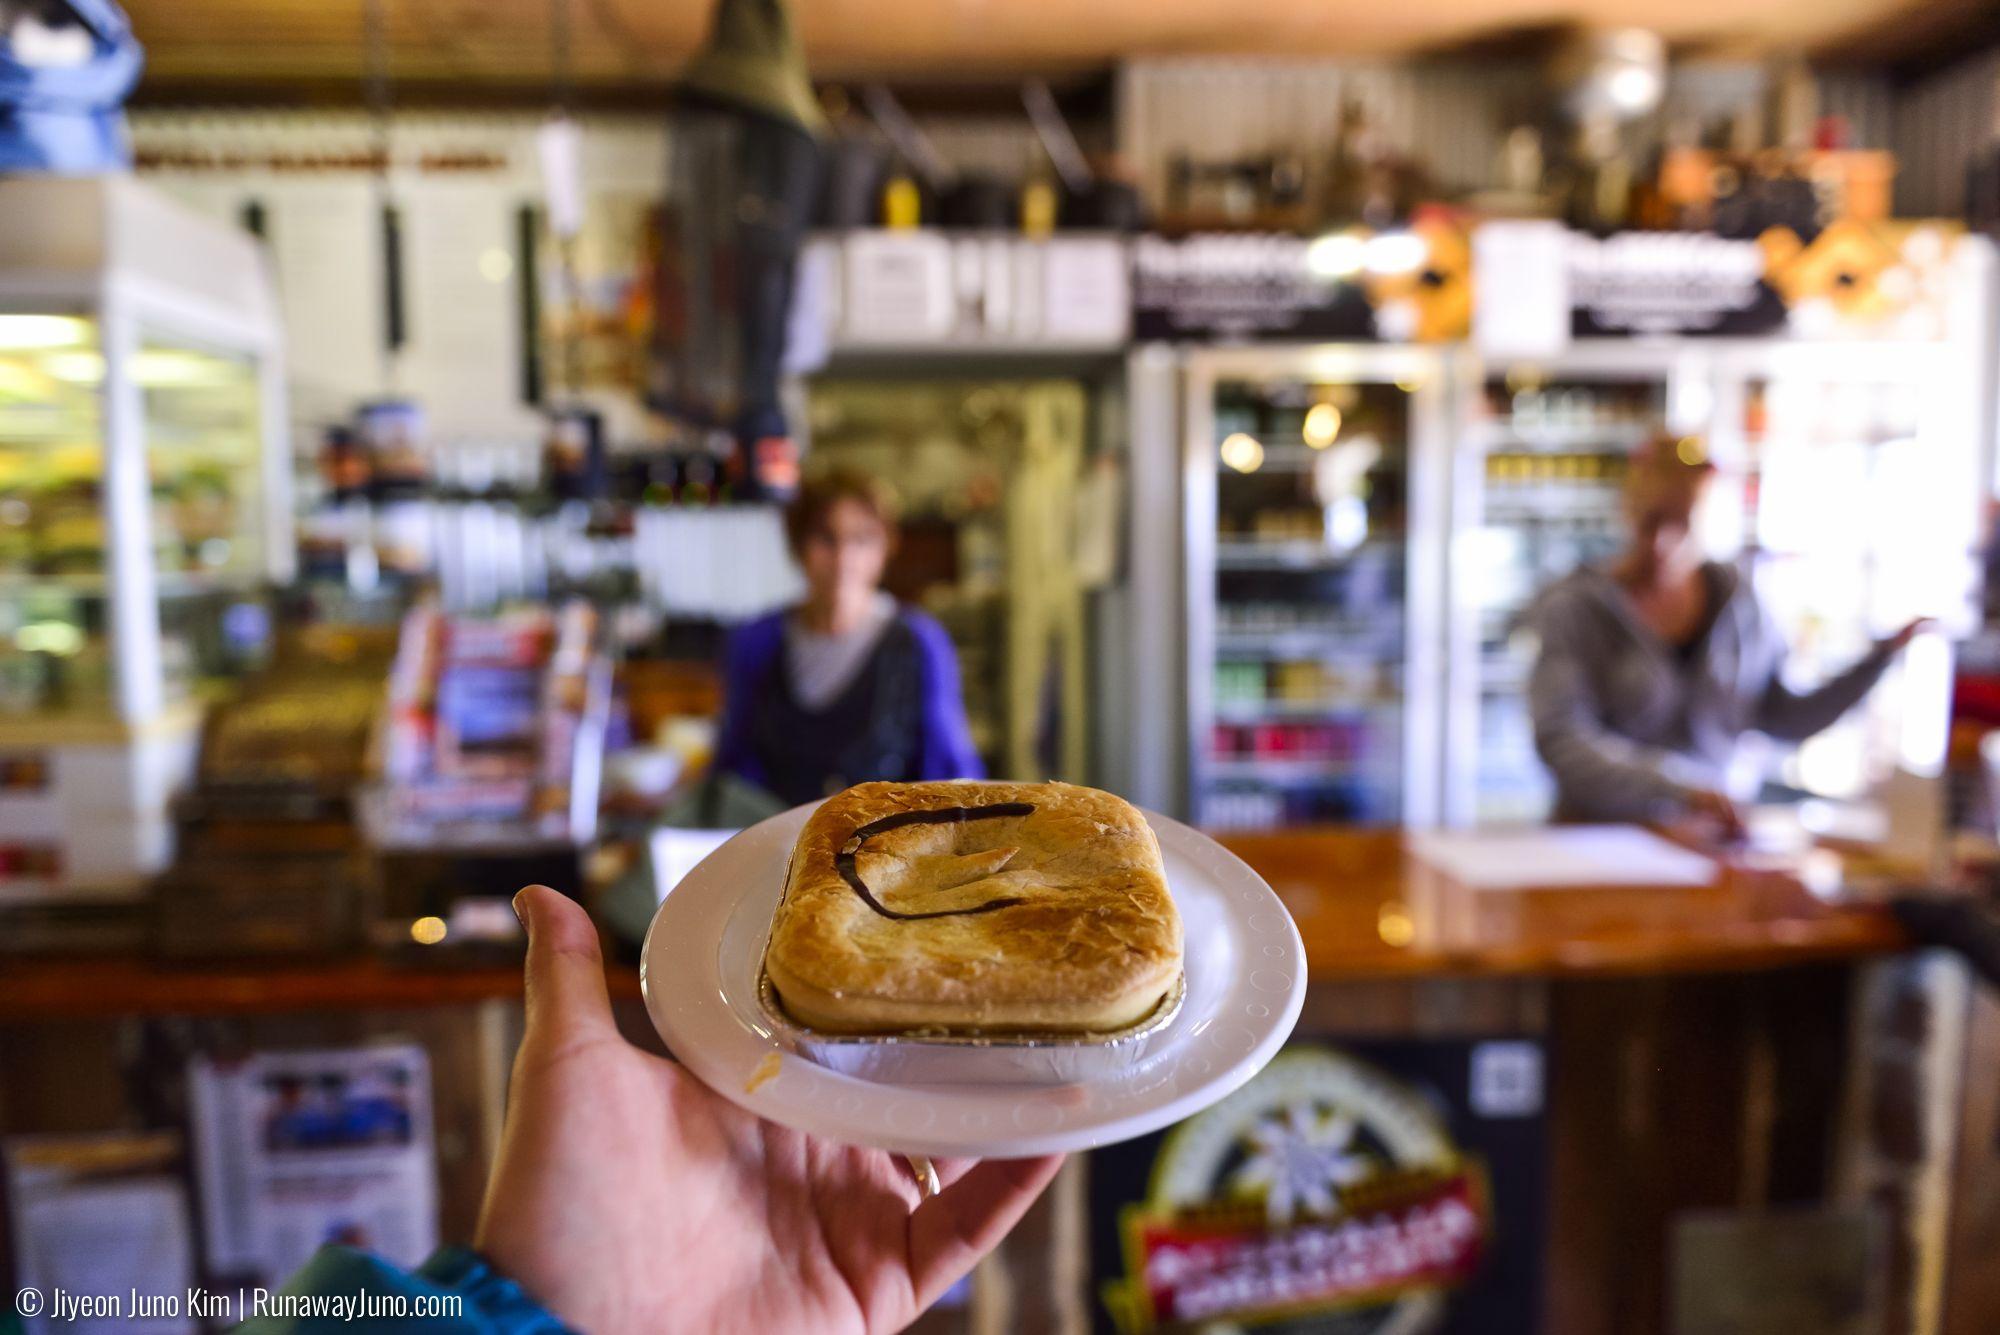 Birdsville bakery: Curried camel pie